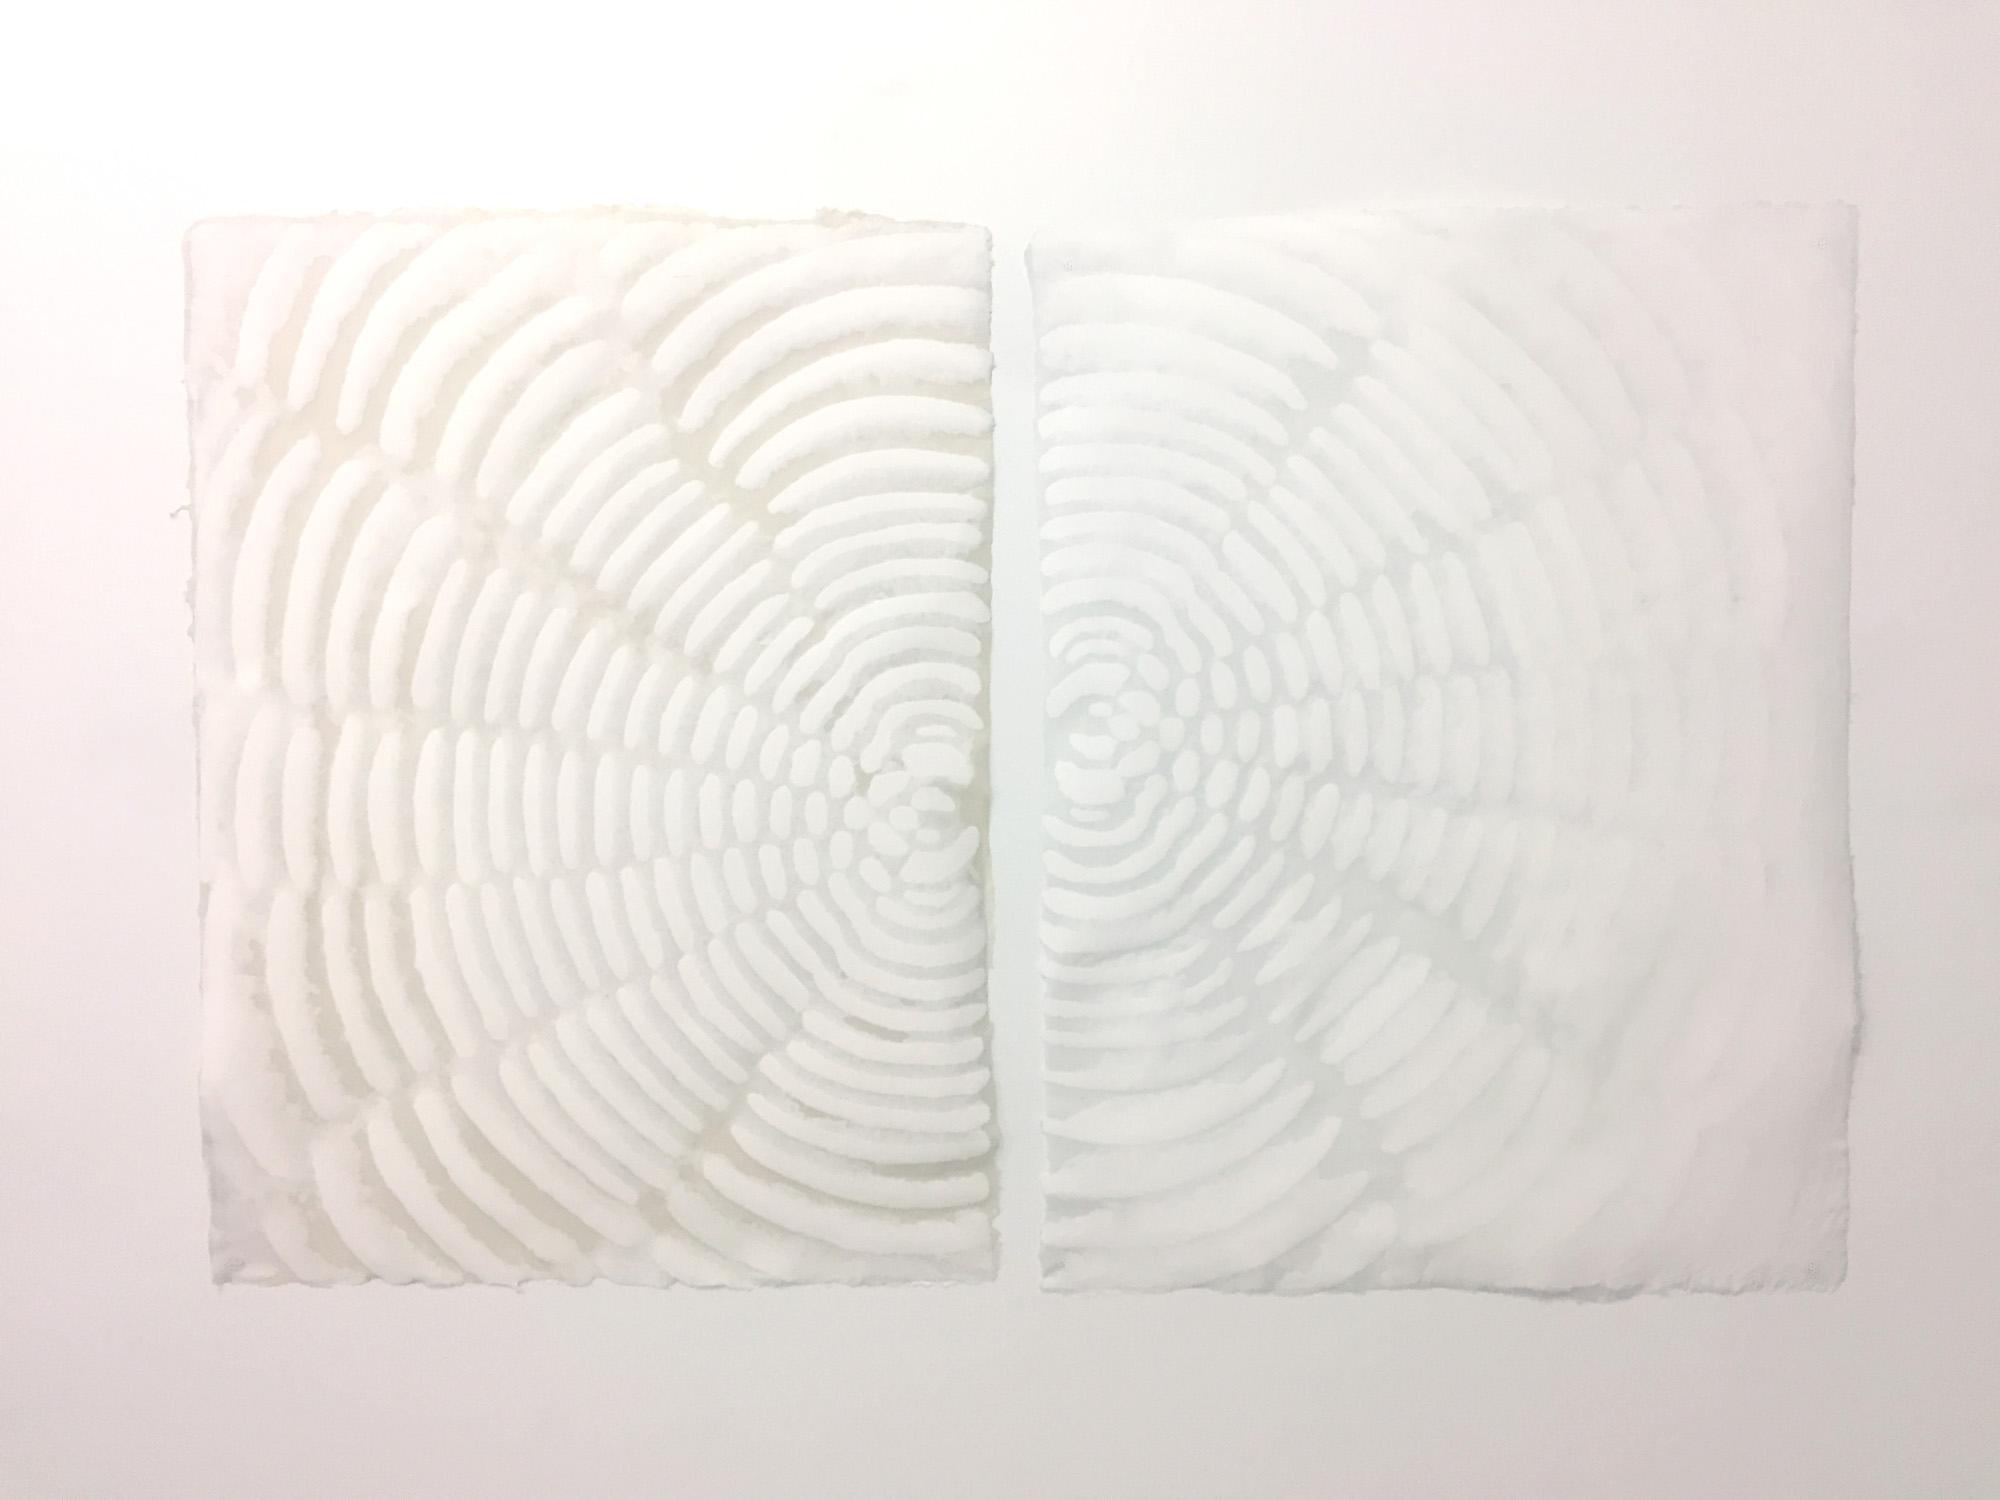 Audra Wolowiec,  waveform , 2017